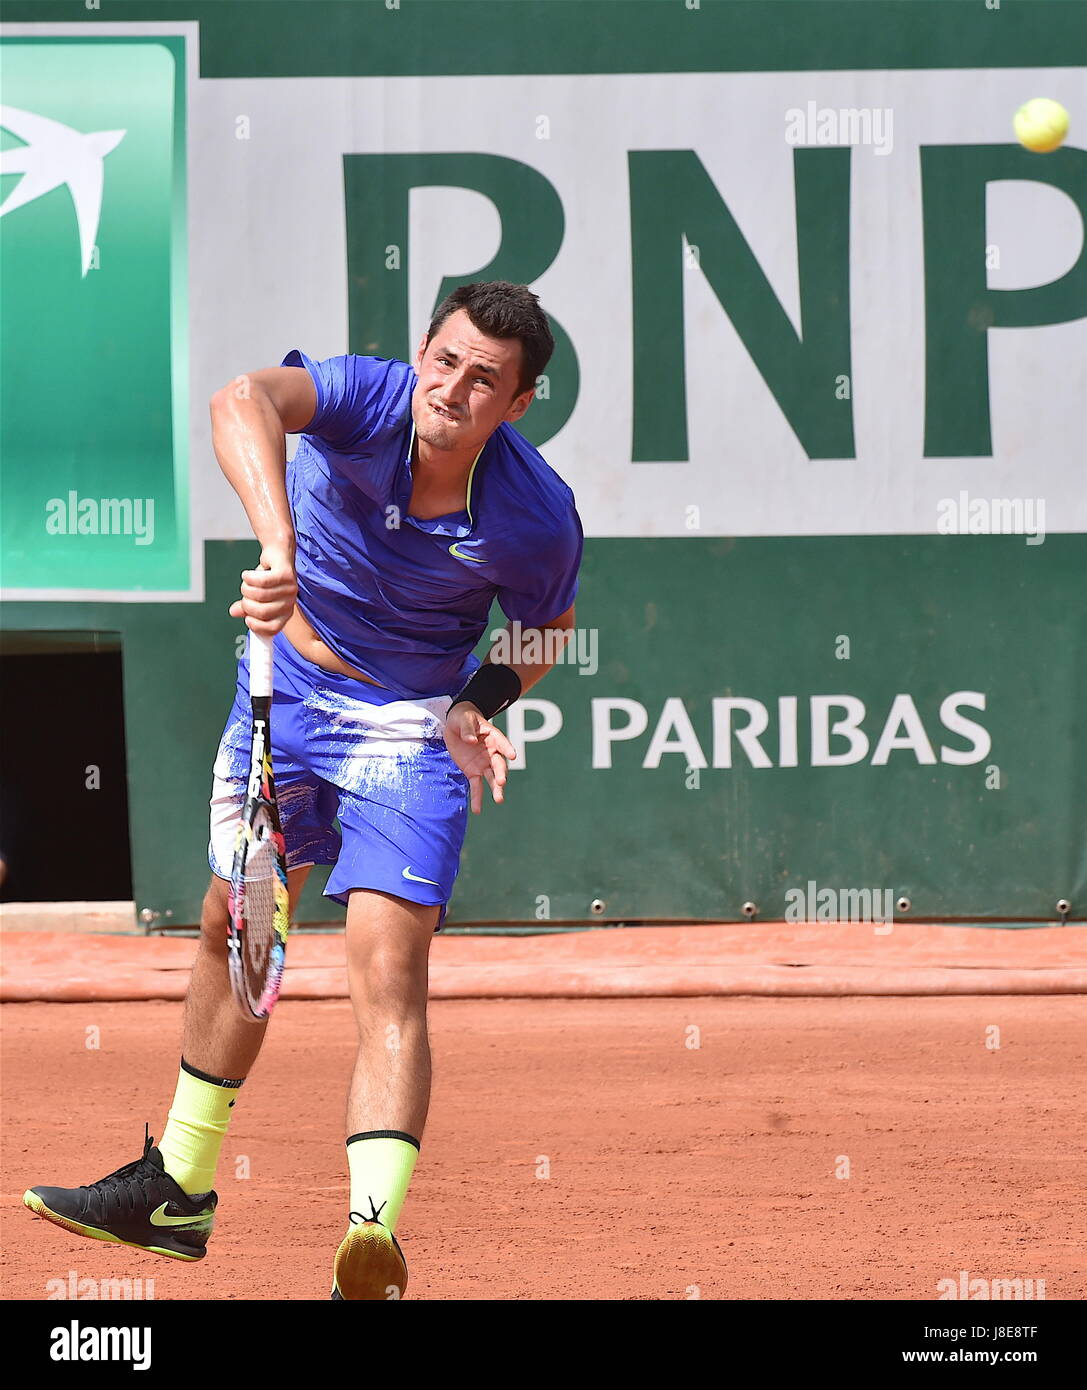 Tennis, Paris, 28.05.2017, Roland Garros, first turn French Open 2017, Bernard Tomic (AUS) Photo: Cronos/Frederic - Stock Image